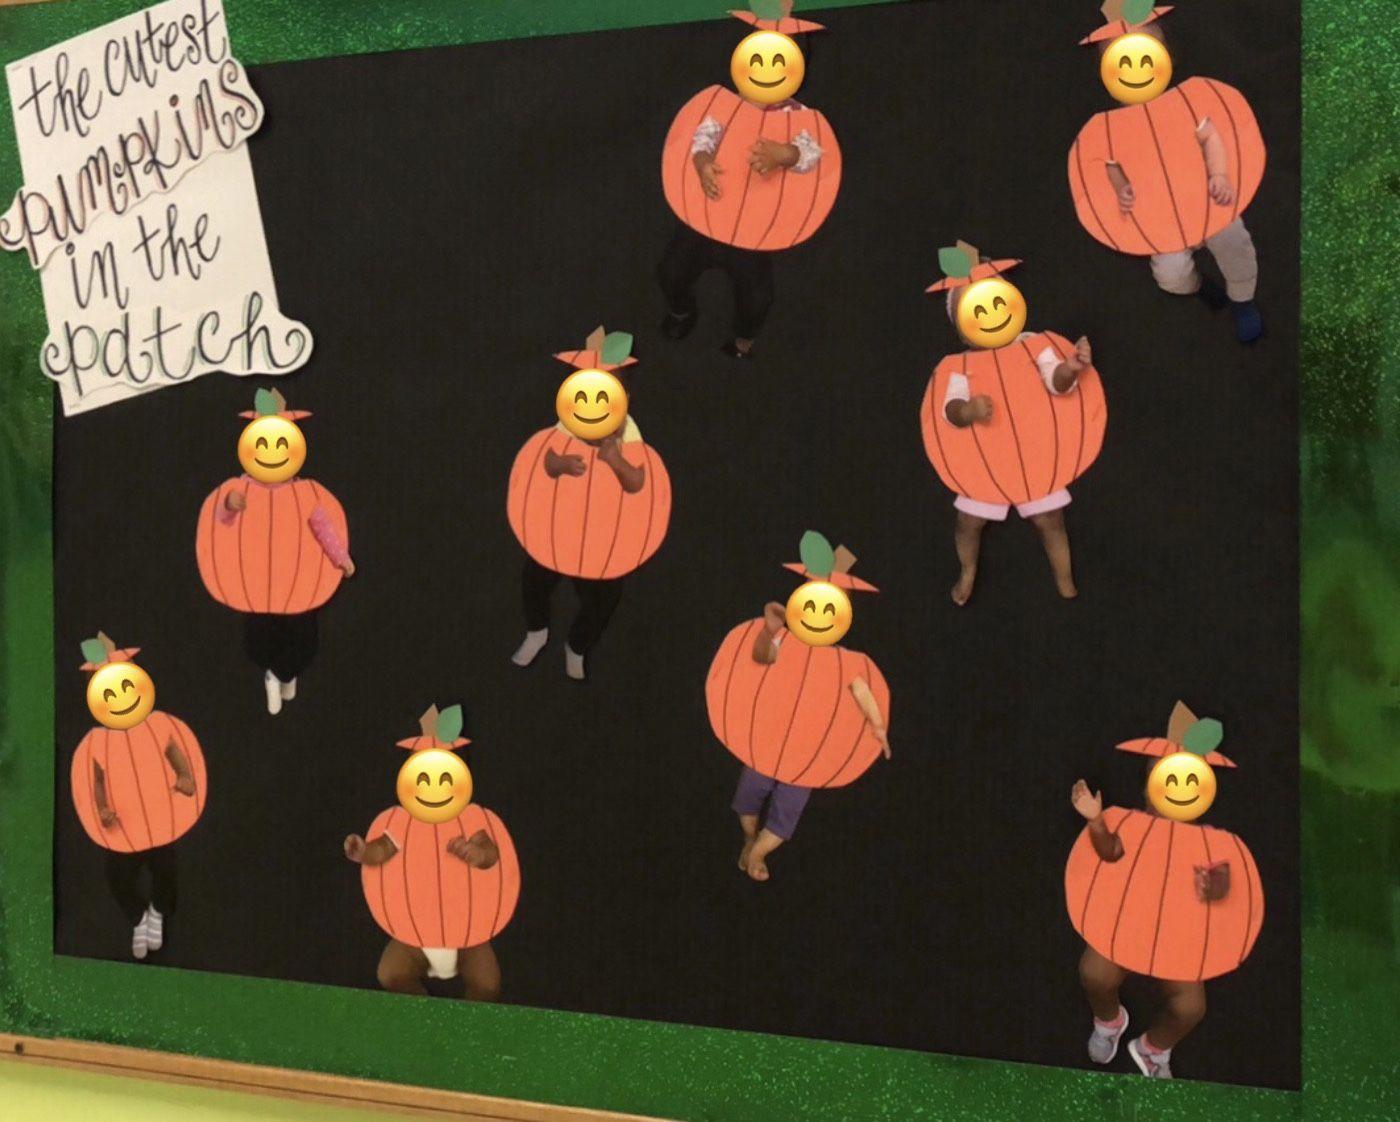 """Cutest Pumpkins in the Patch"" October 2018 Bulletin Board #pumpkinpatchbulletinboard"